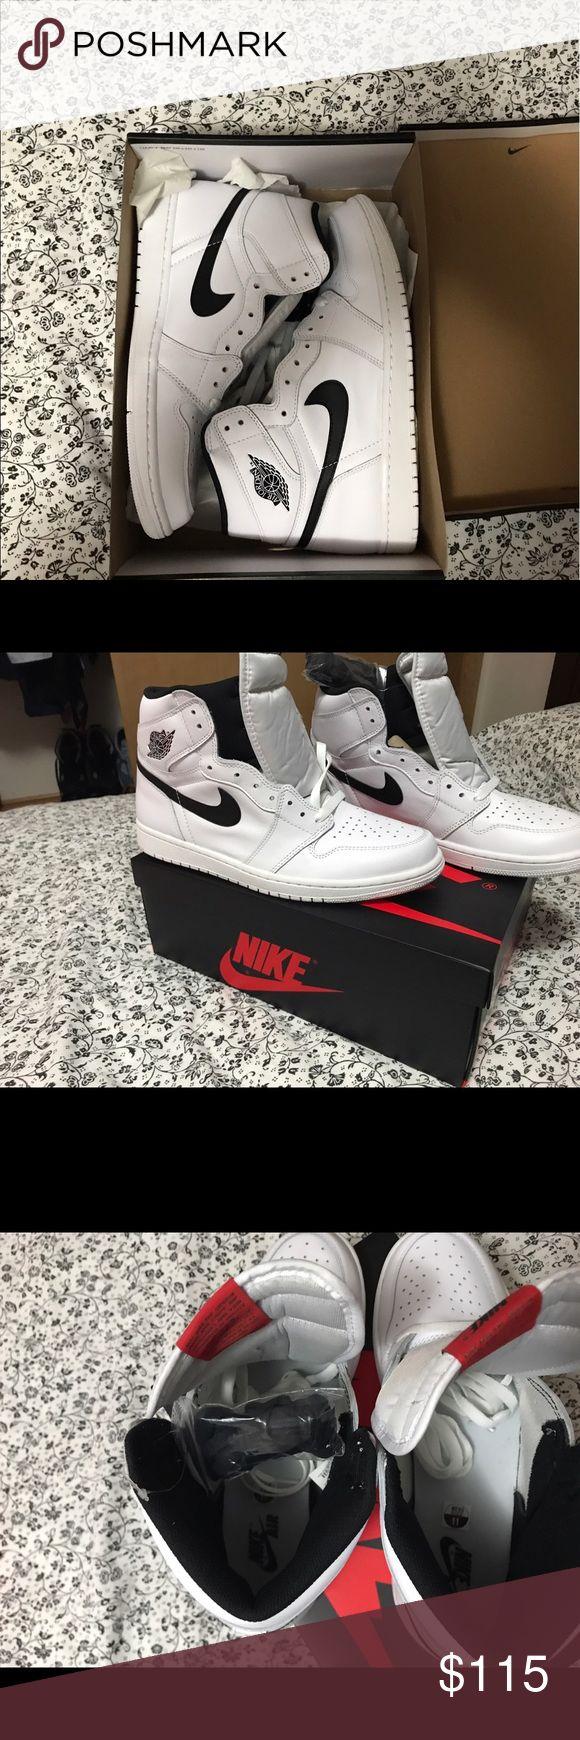 New Jordan 1 OG high Yin Yang New never worn Nike Air Jordan 1 High OG Yin Yang size 11 men's size deadstock. Jordan Shoes Sneakers